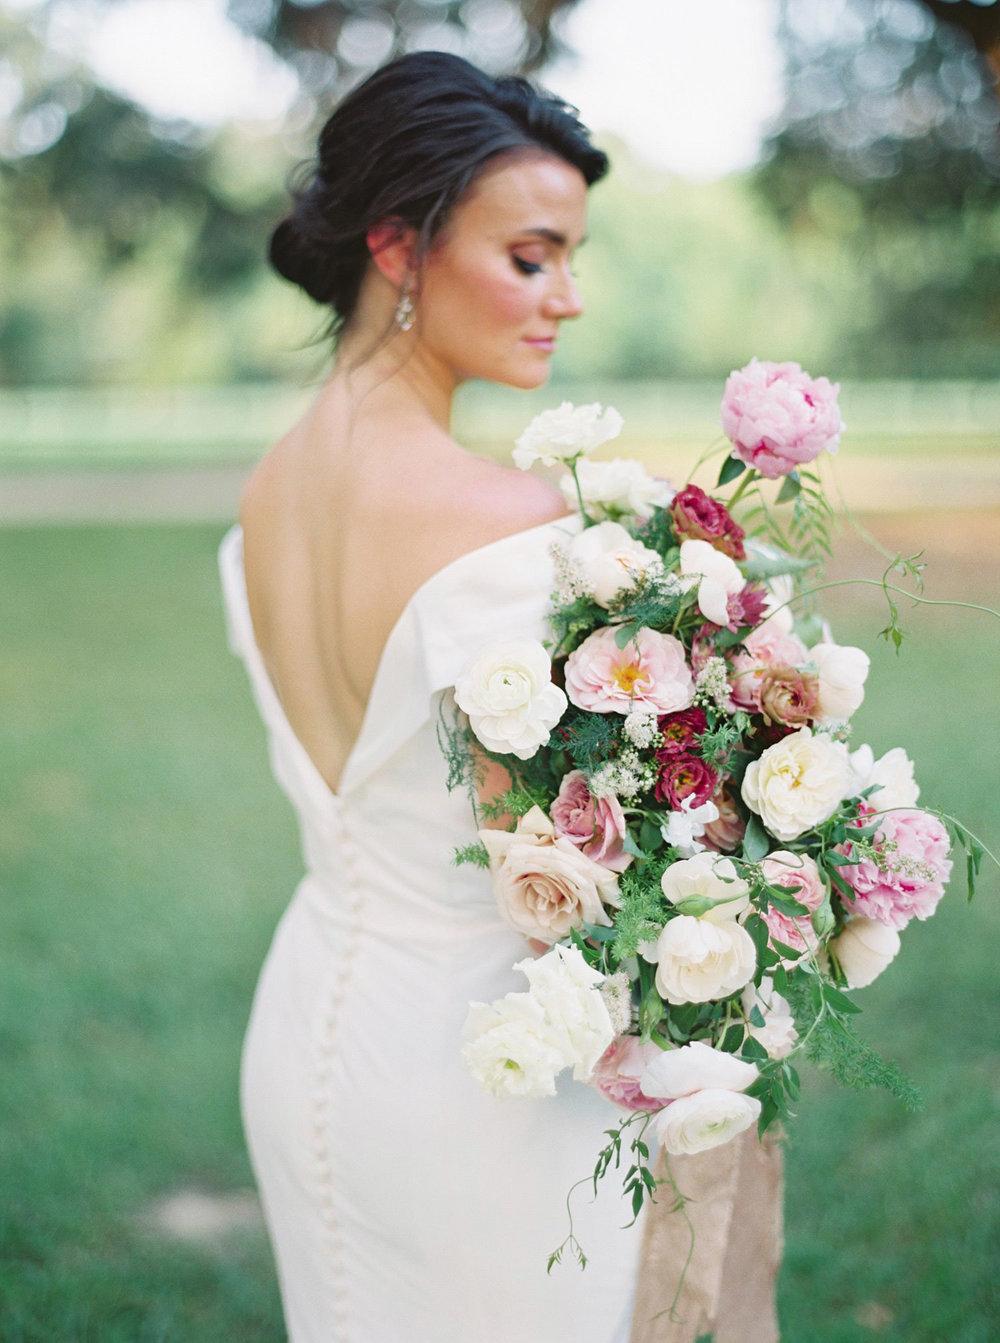 Mauve, dusty rose, blush, and white fine art wedding bouquet